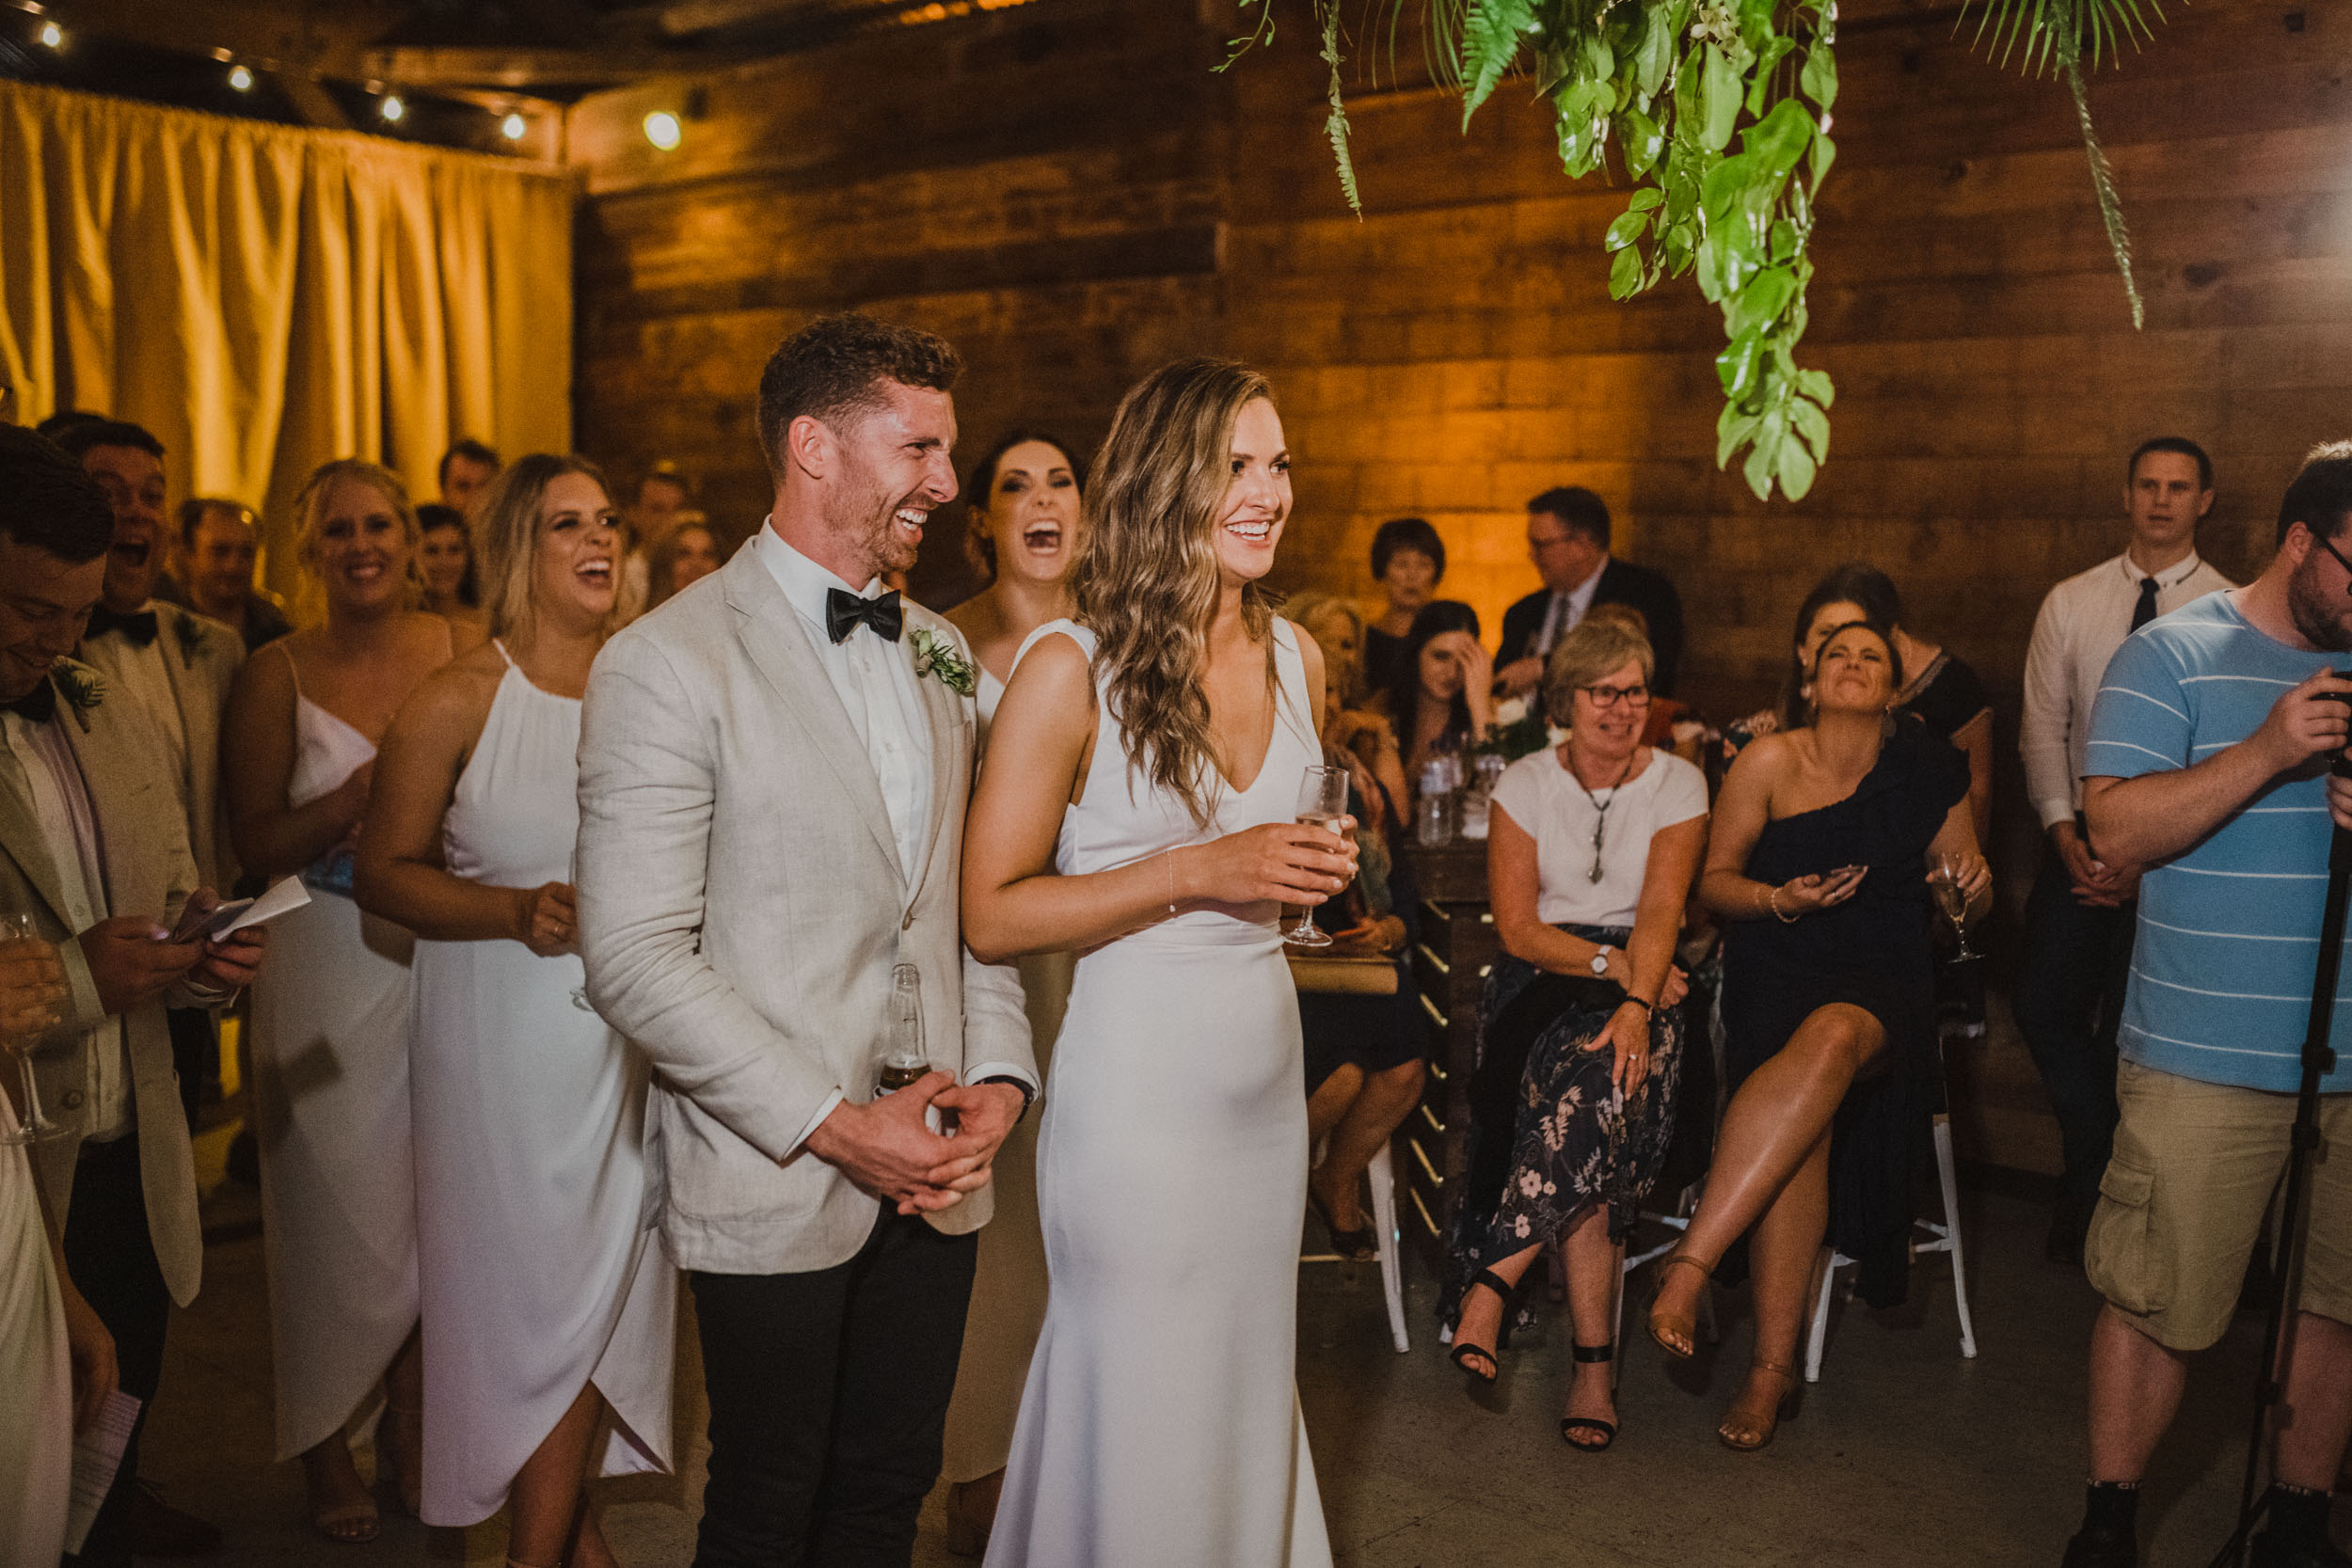 The Raw Photographer - Cairns Wedding Photographer - Port Douglas - Sugar Wharf - Vasaliki Couture Dress - Destination Venue-75.jpg